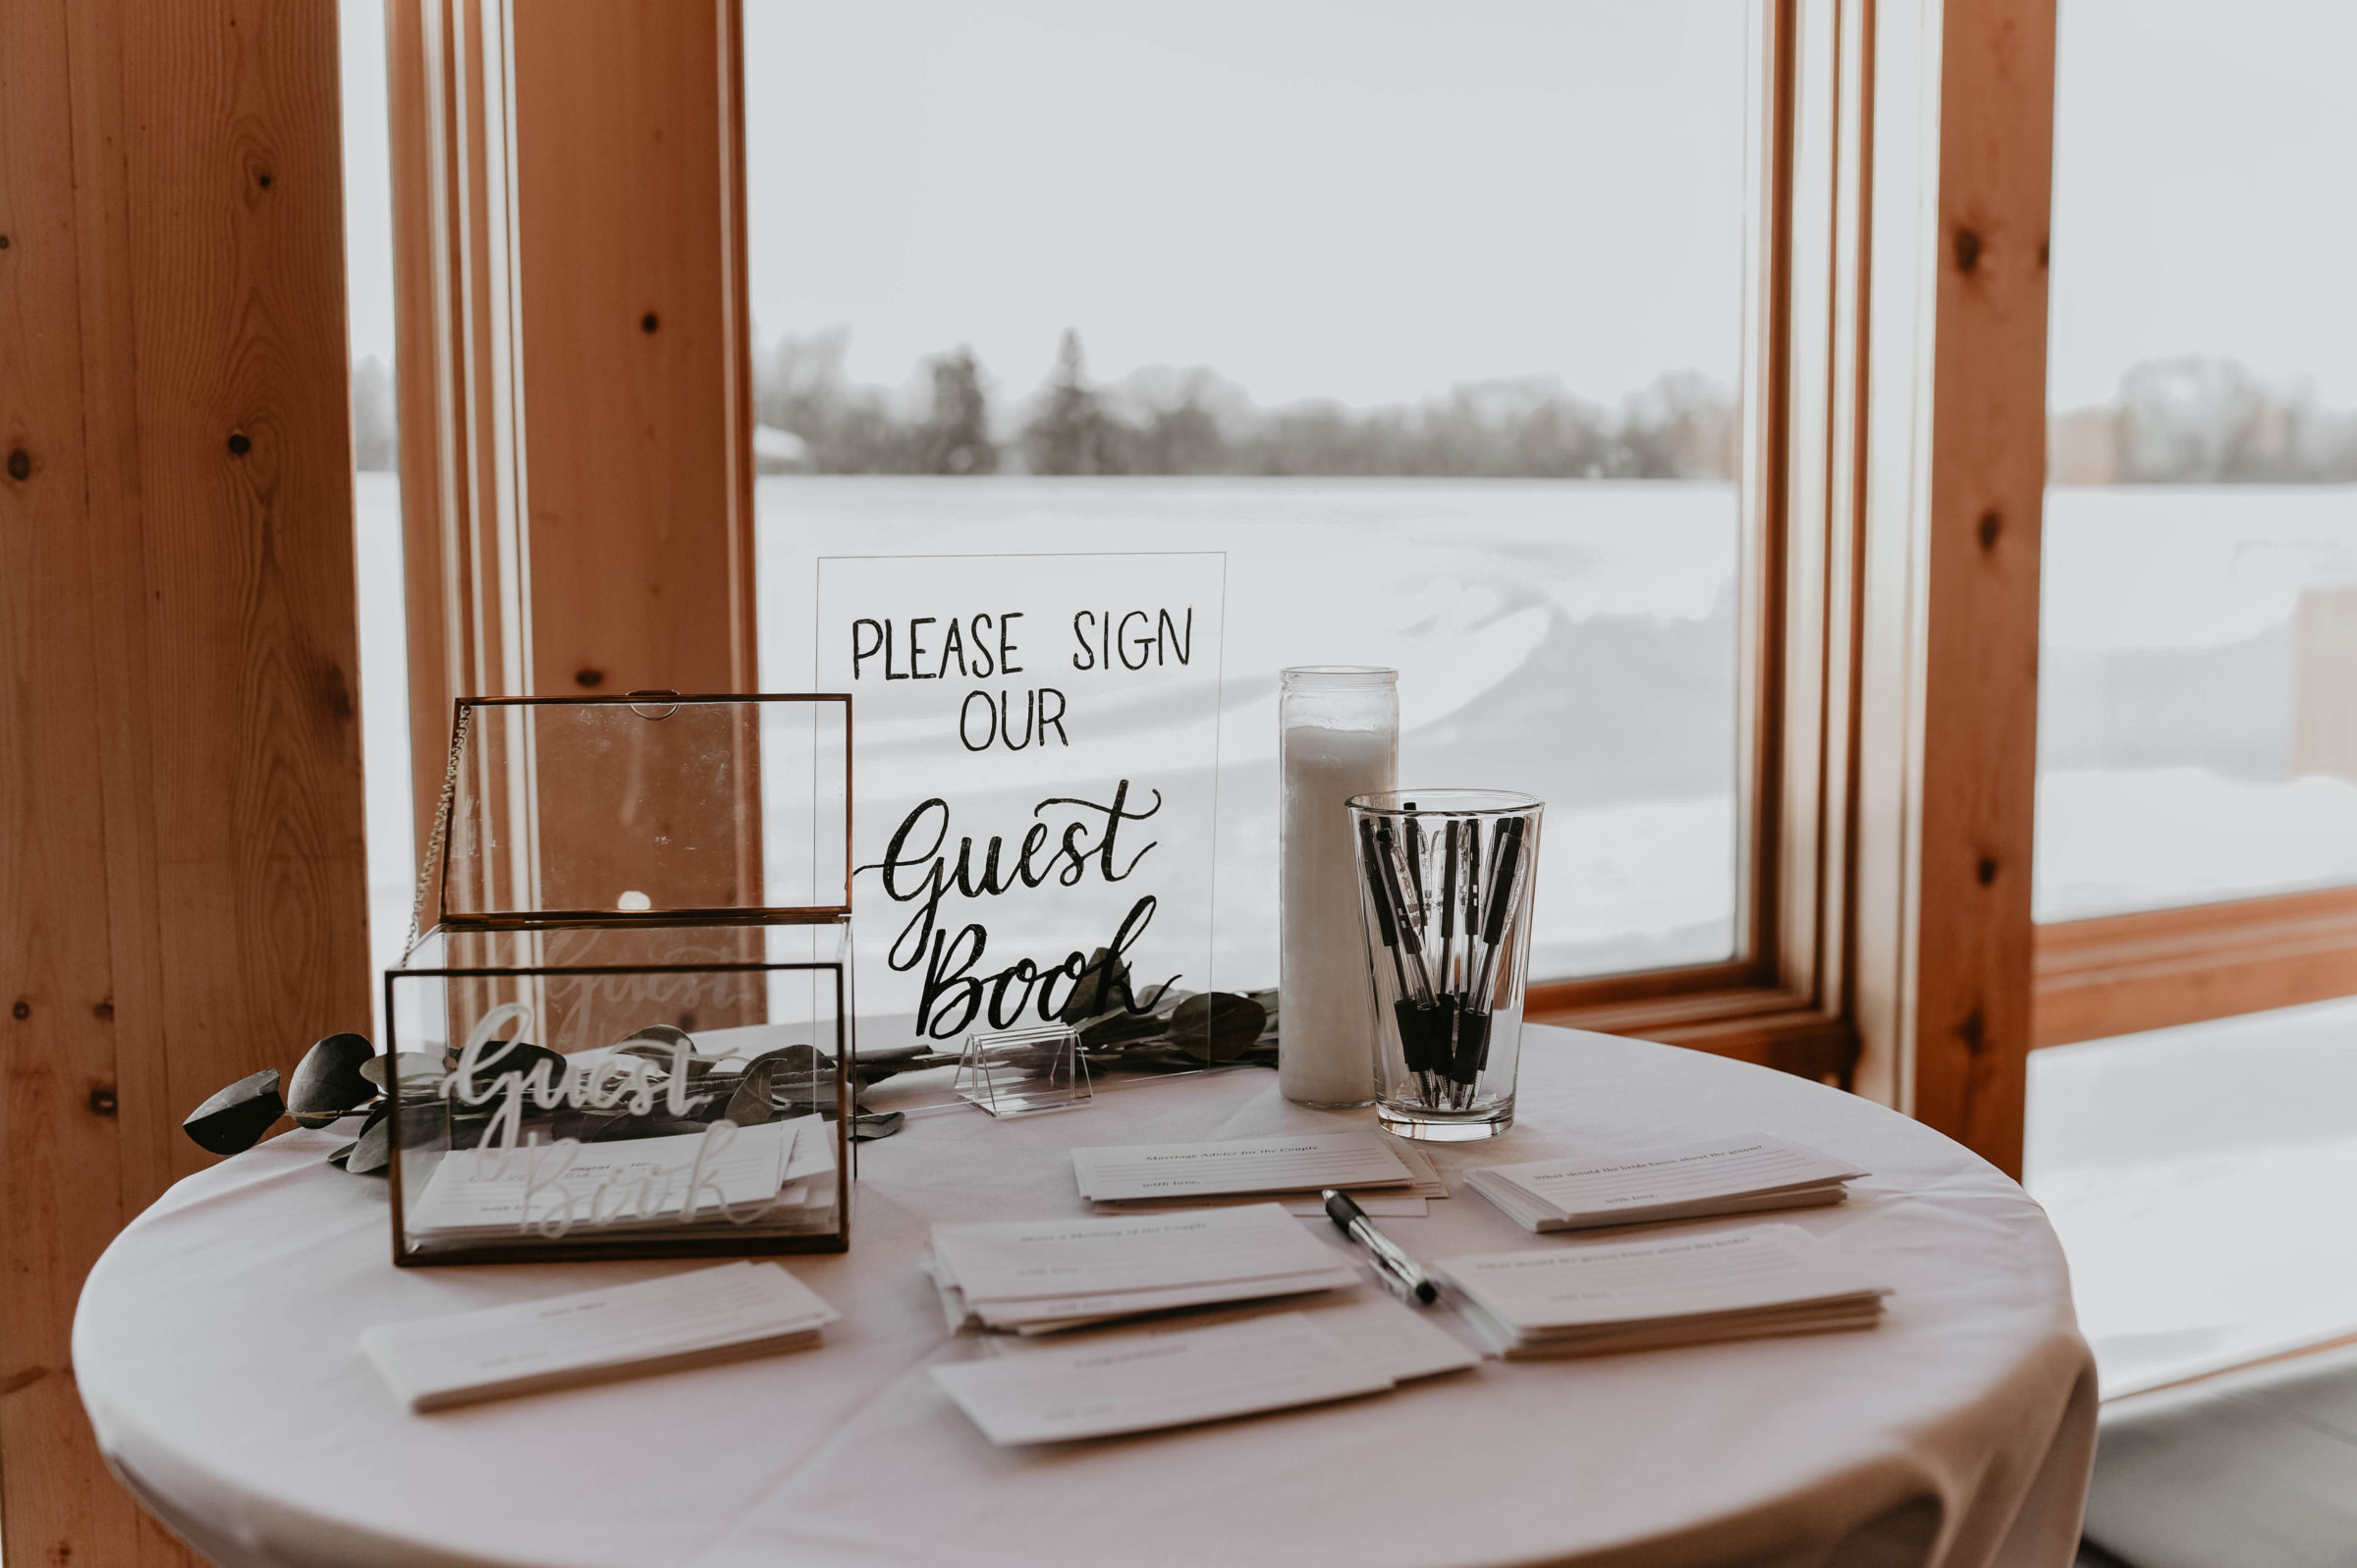 Wedding signage by Mini Memo CO